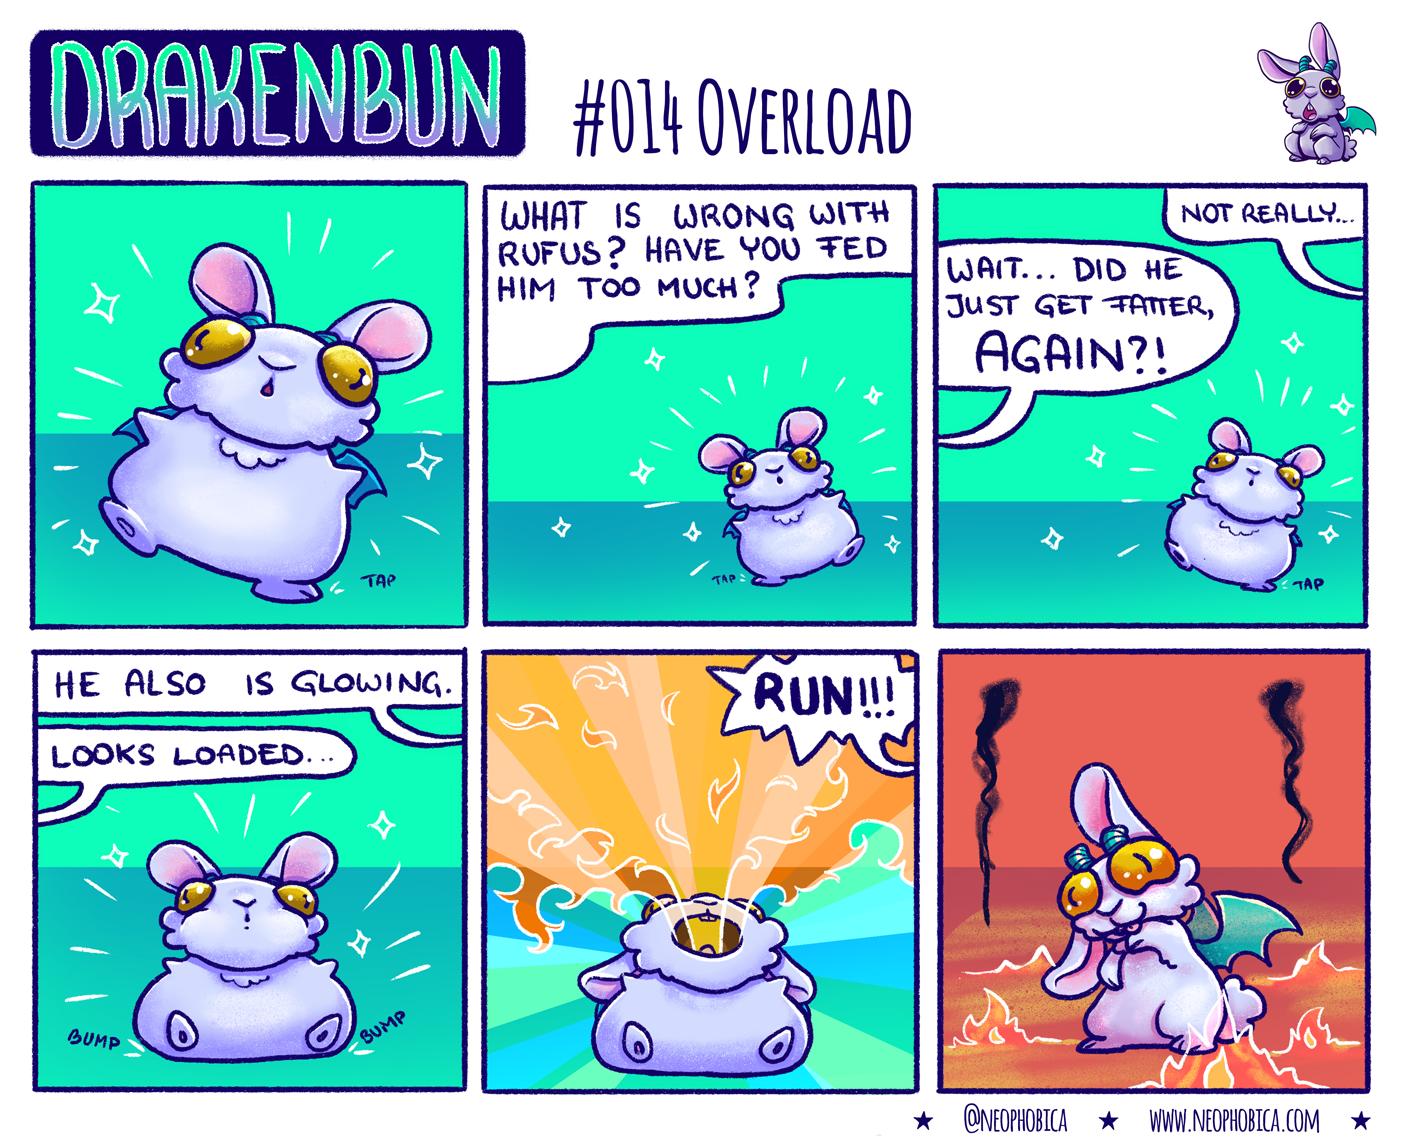 #014 Overload